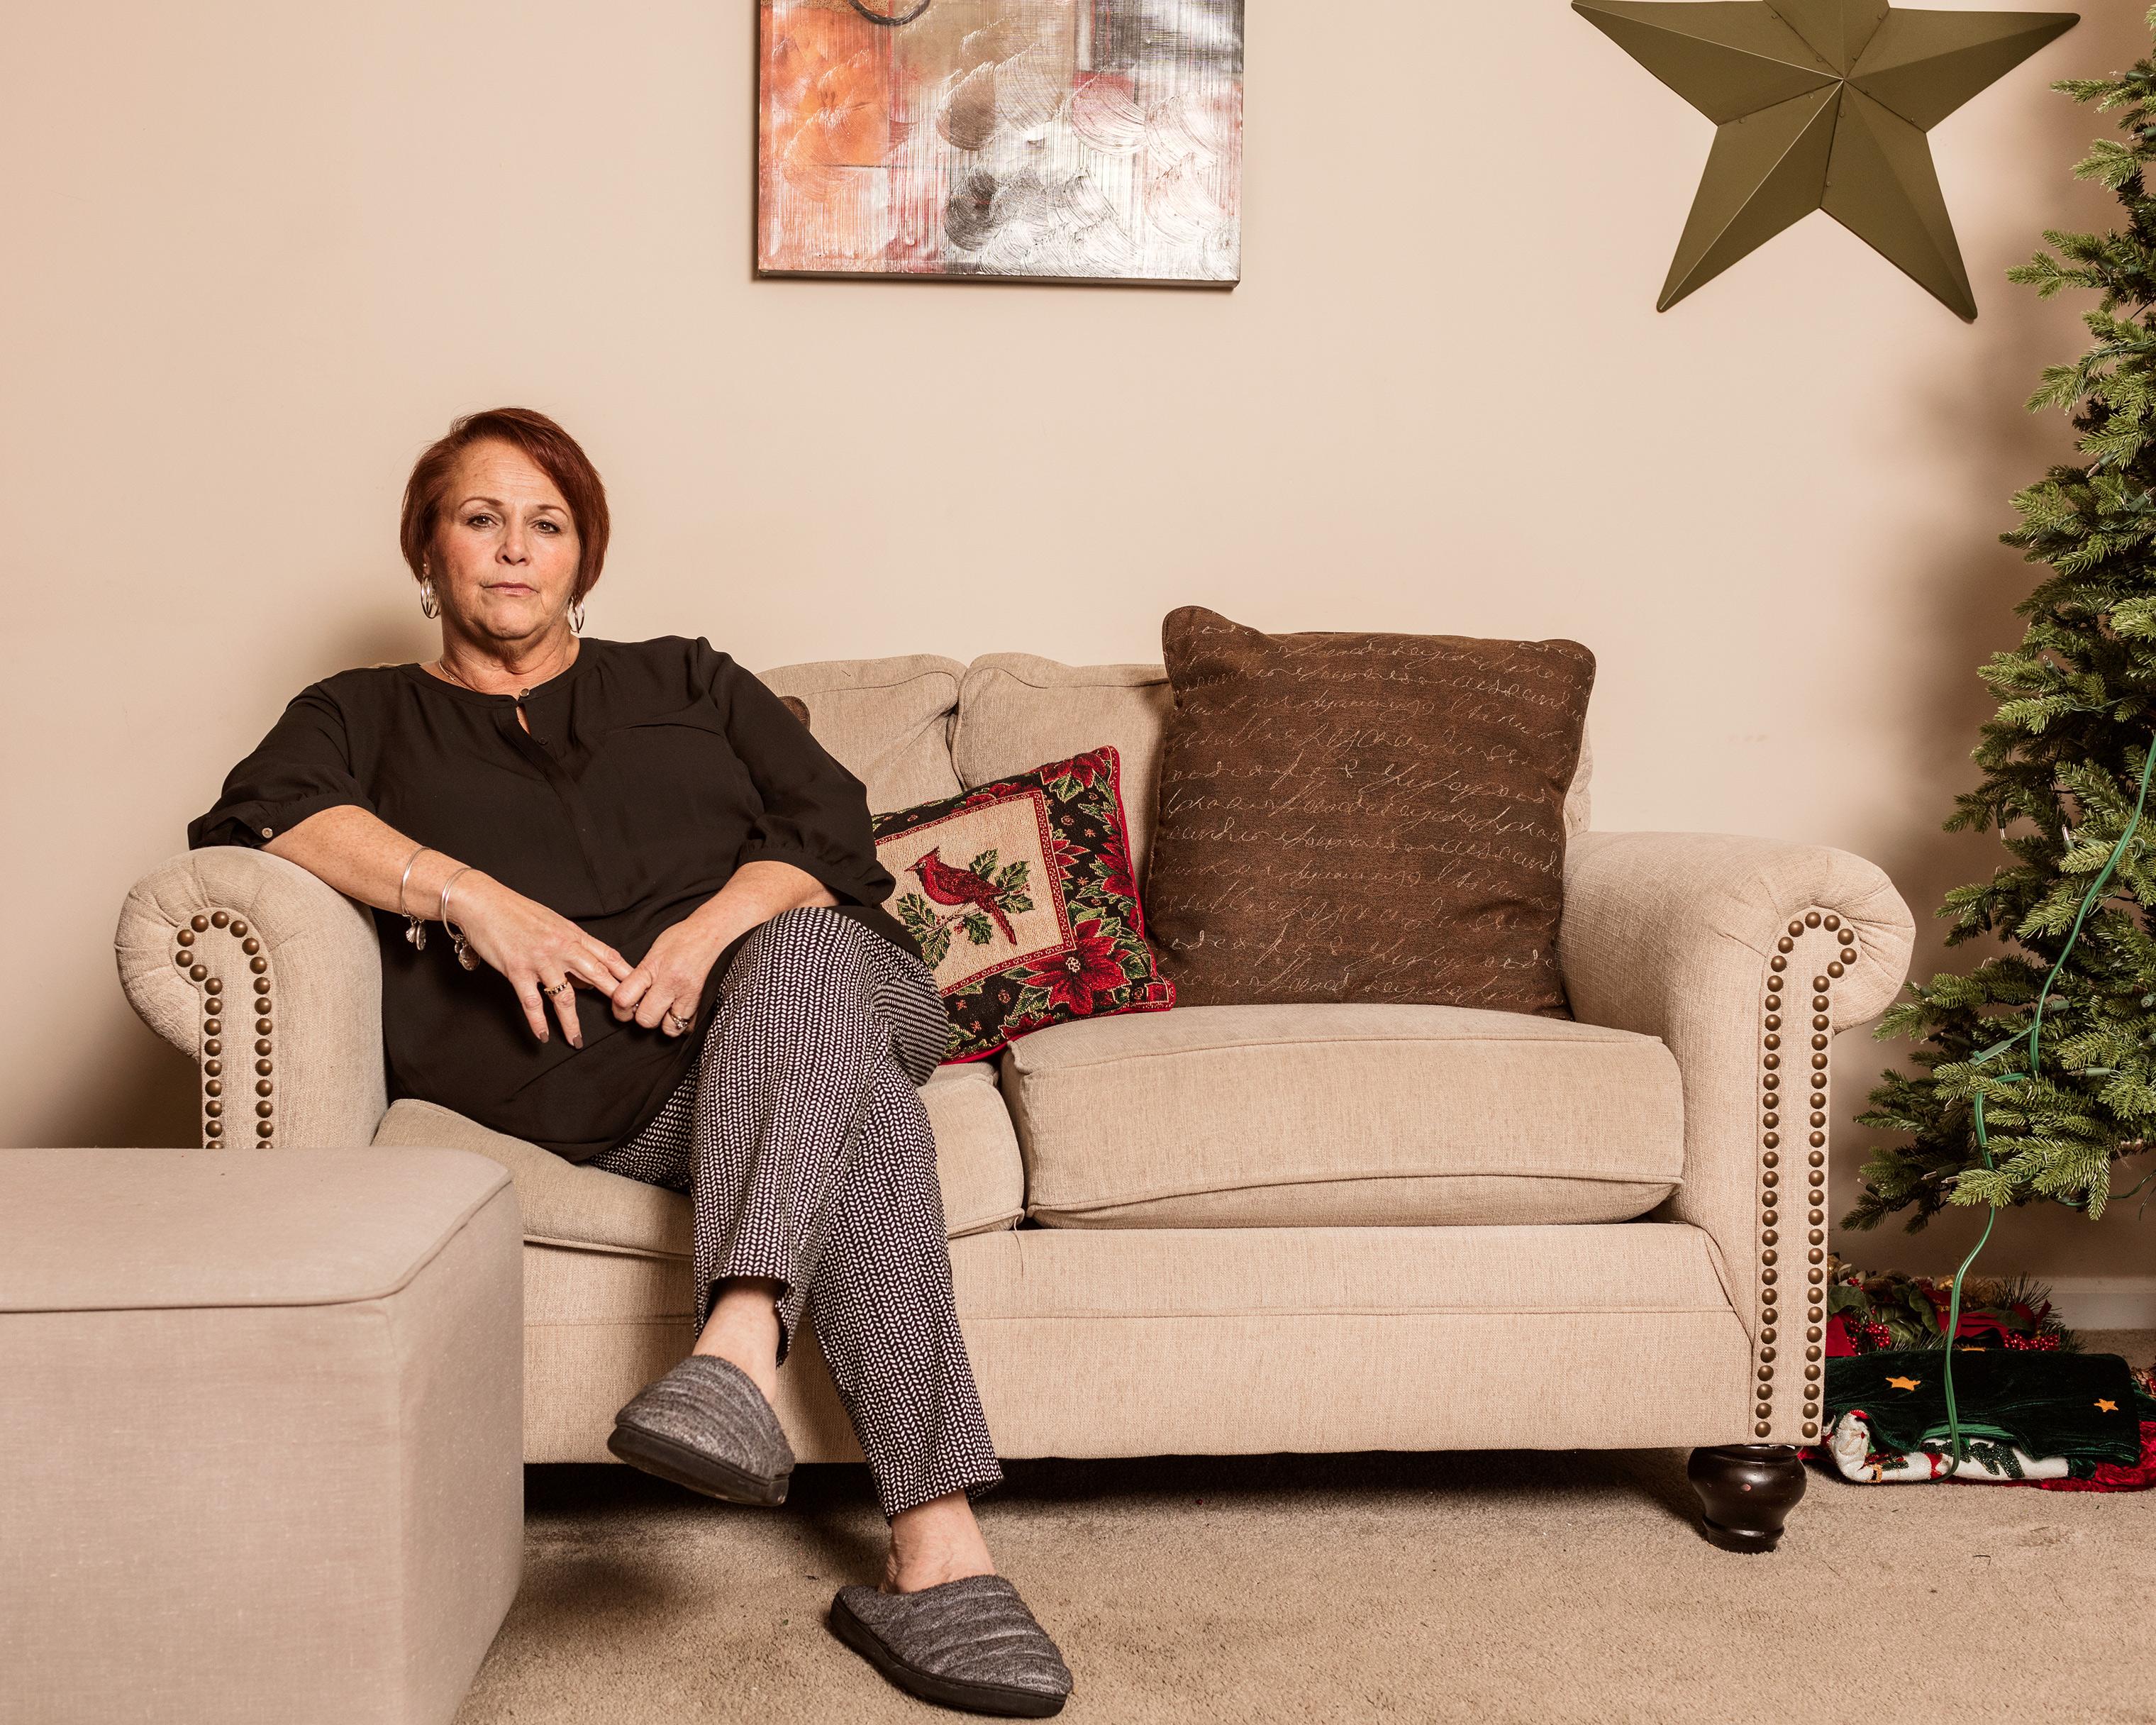 Ann Marie Reinhart Smith at her home in Durham, N.C.